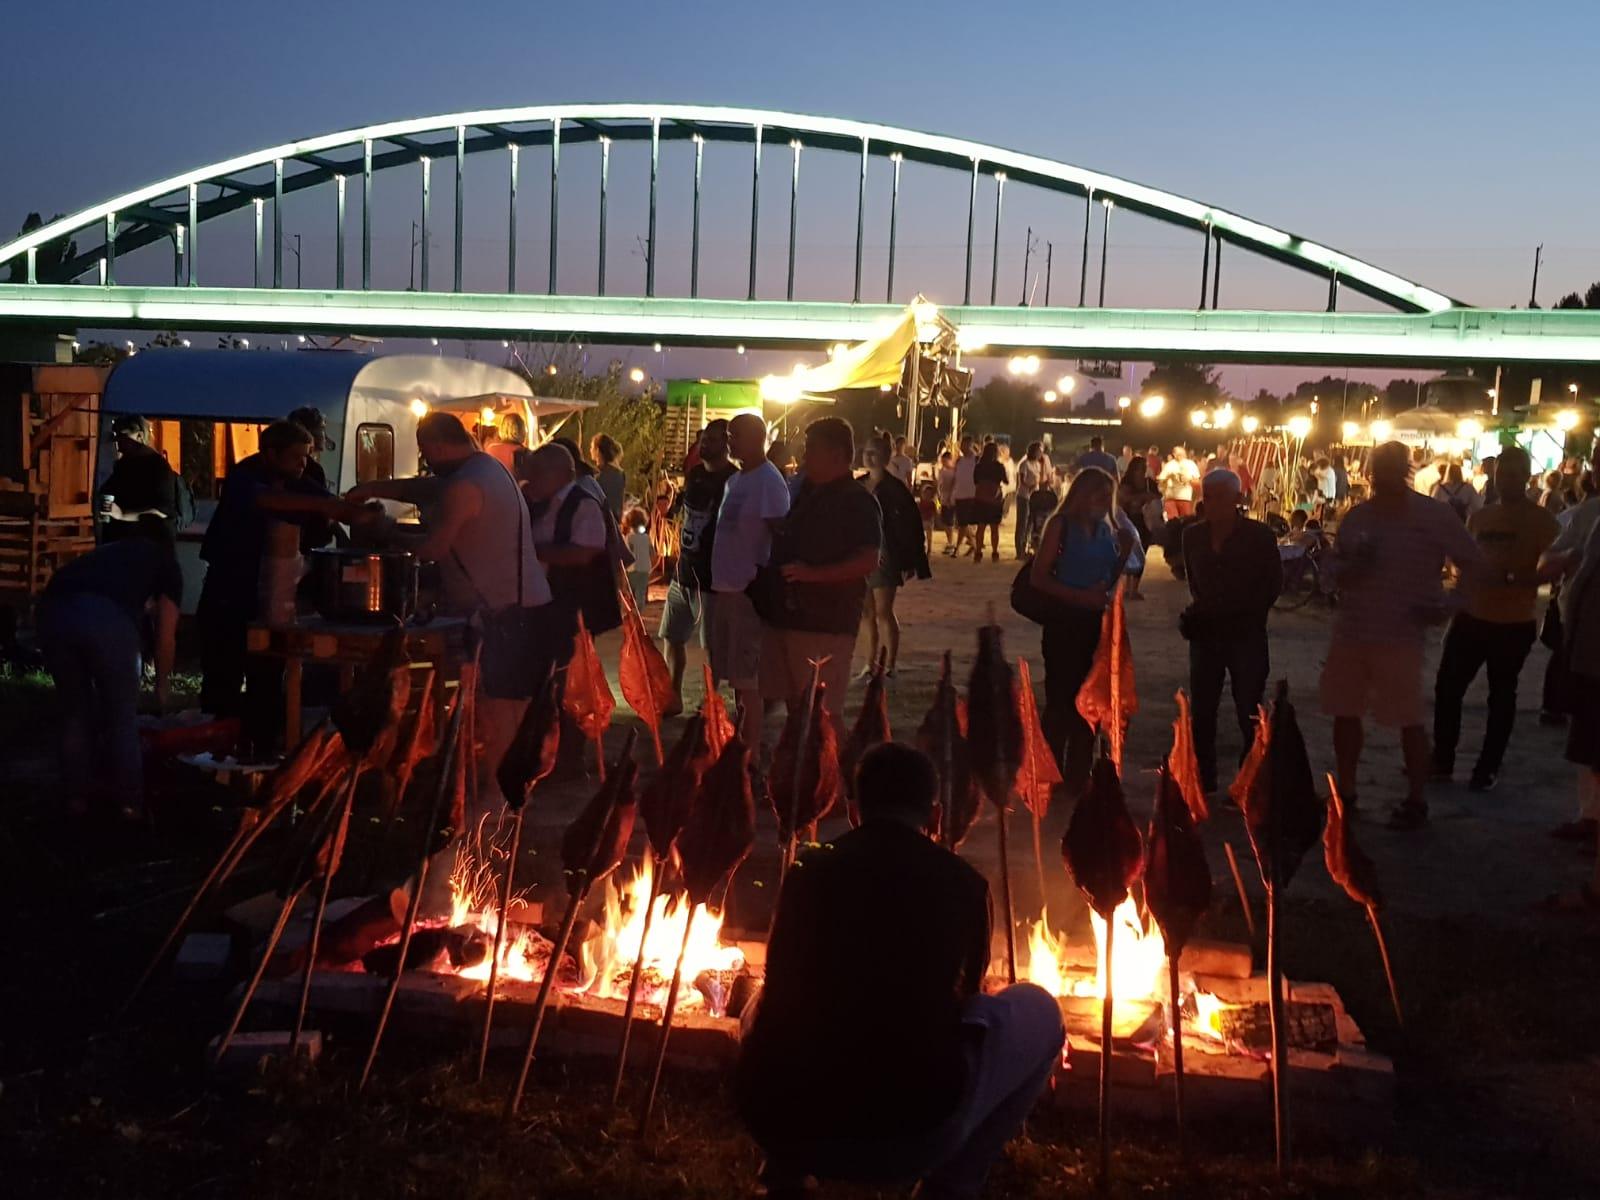 VIDEO) Posjetili smo Green River festival na Savi: Izgleda prilično  čarobno, pogotovo kad se spusti mrak...   Zagreb.info